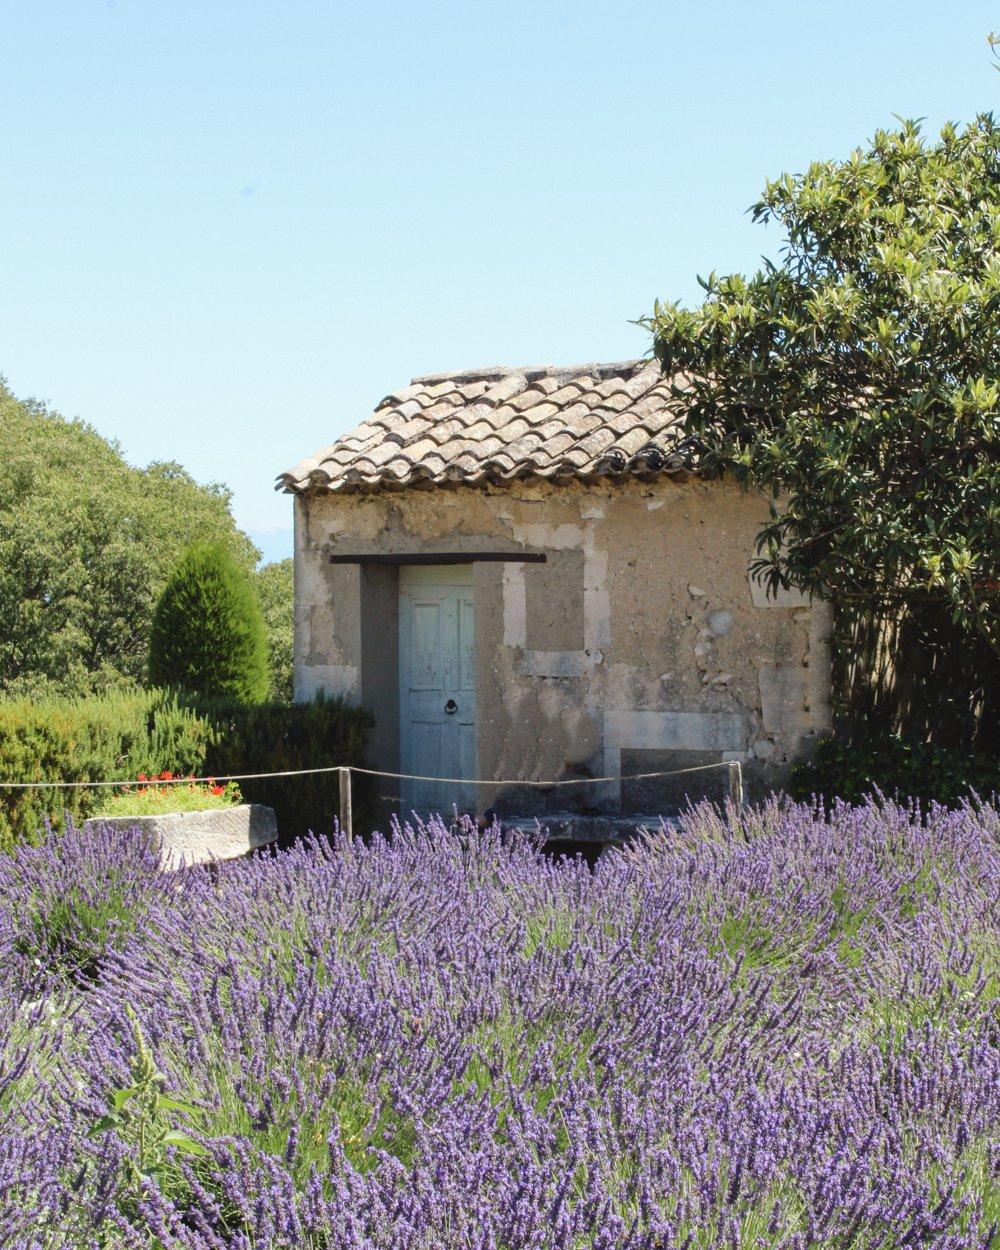 3 Day Provence Itinerary- Saint Remy